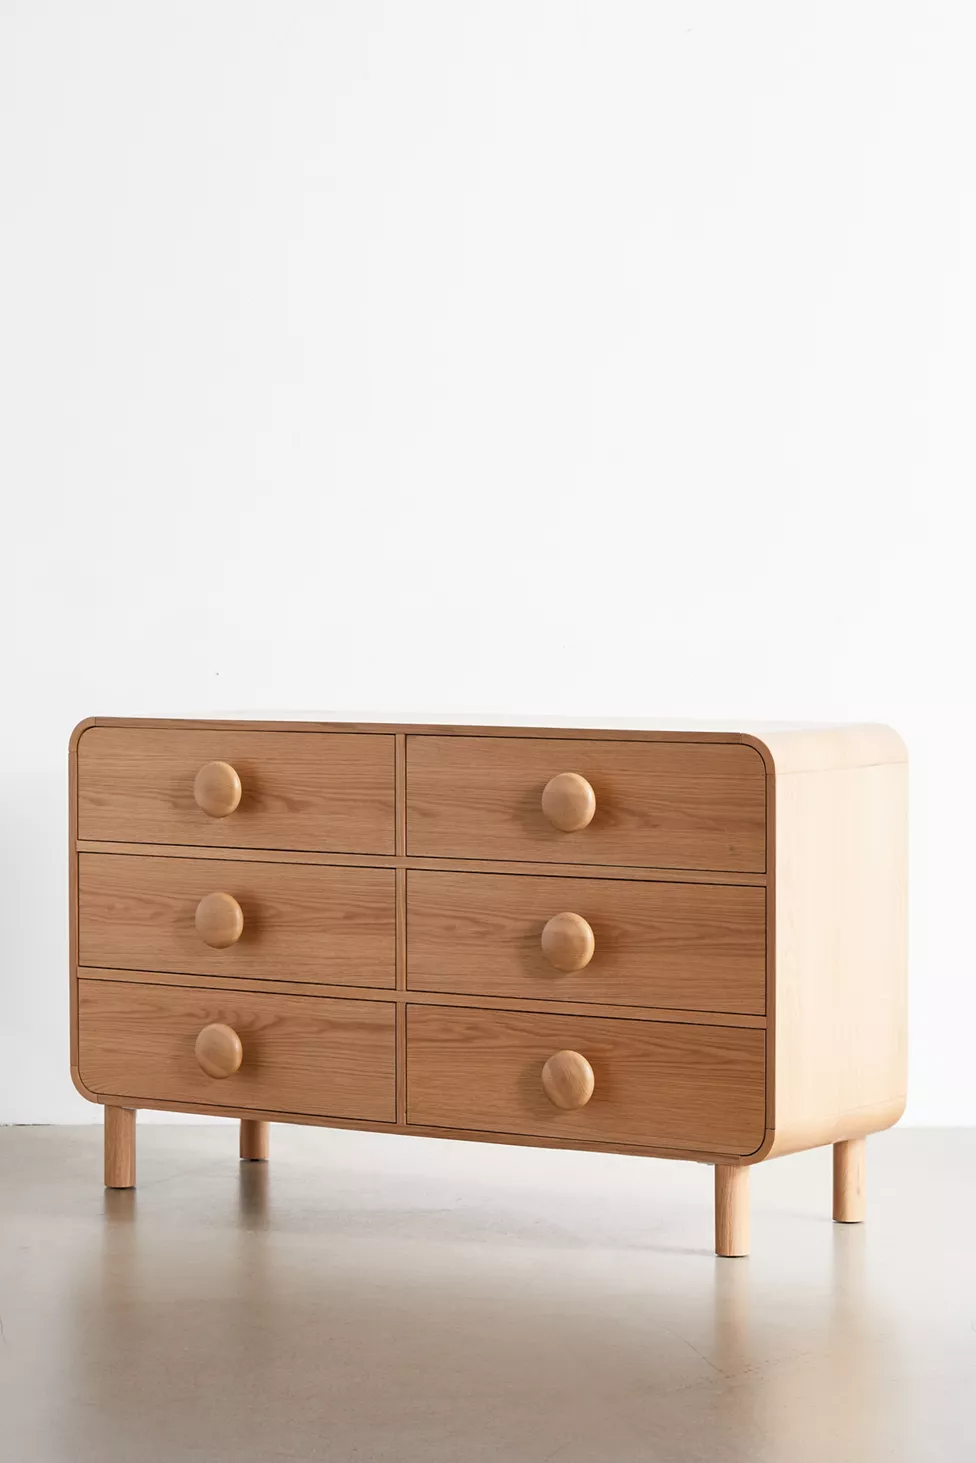 Tabitha Tall Dresser 6 Drawer Dresser Dresser Drawers Dresser [ 1463 x 976 Pixel ]